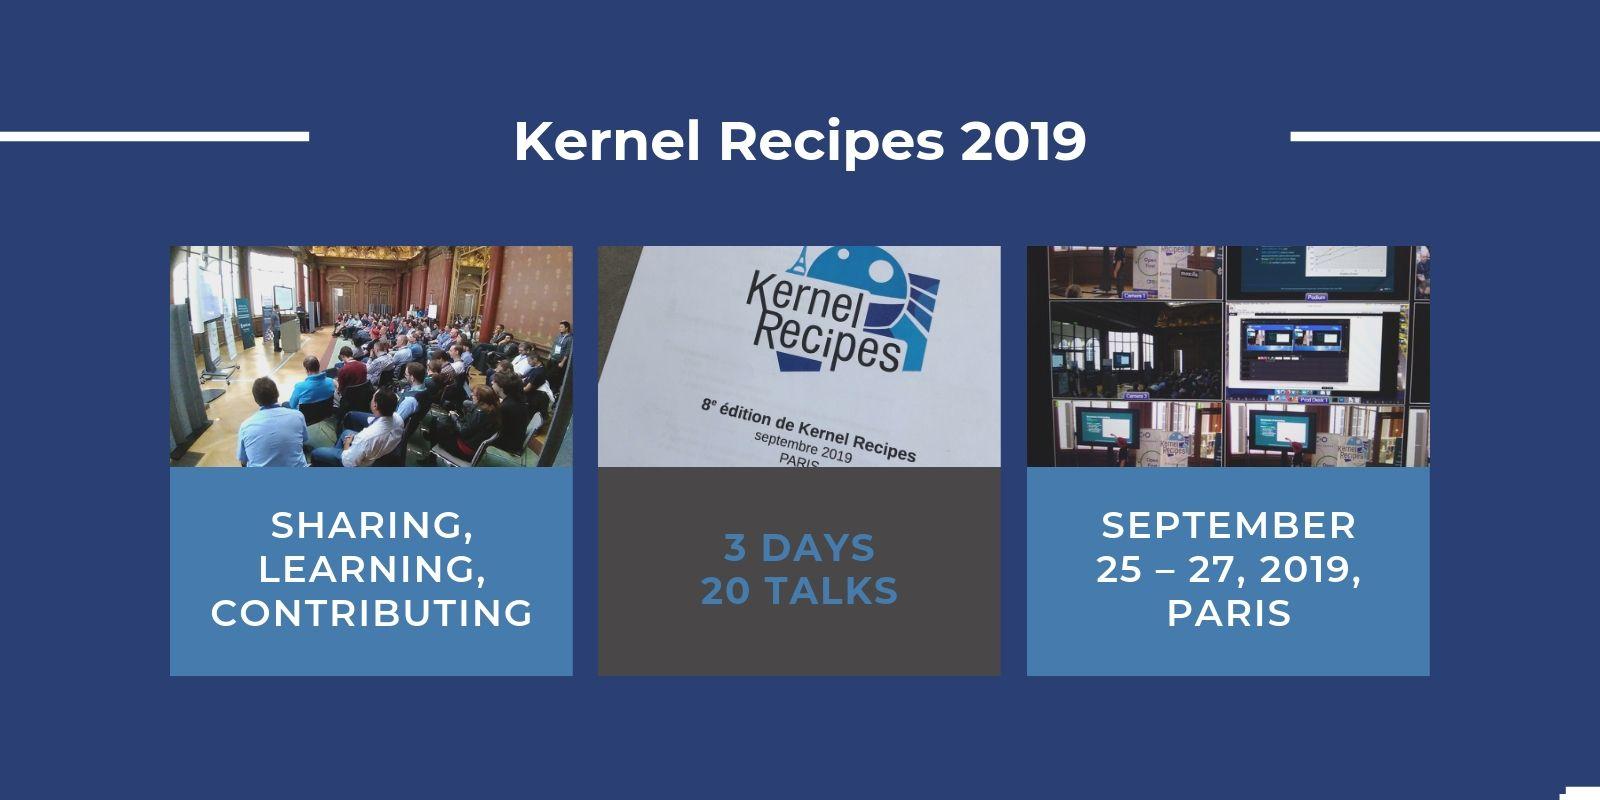 Kernel Recipes 2019 : les inscriptions sont ouvertes !